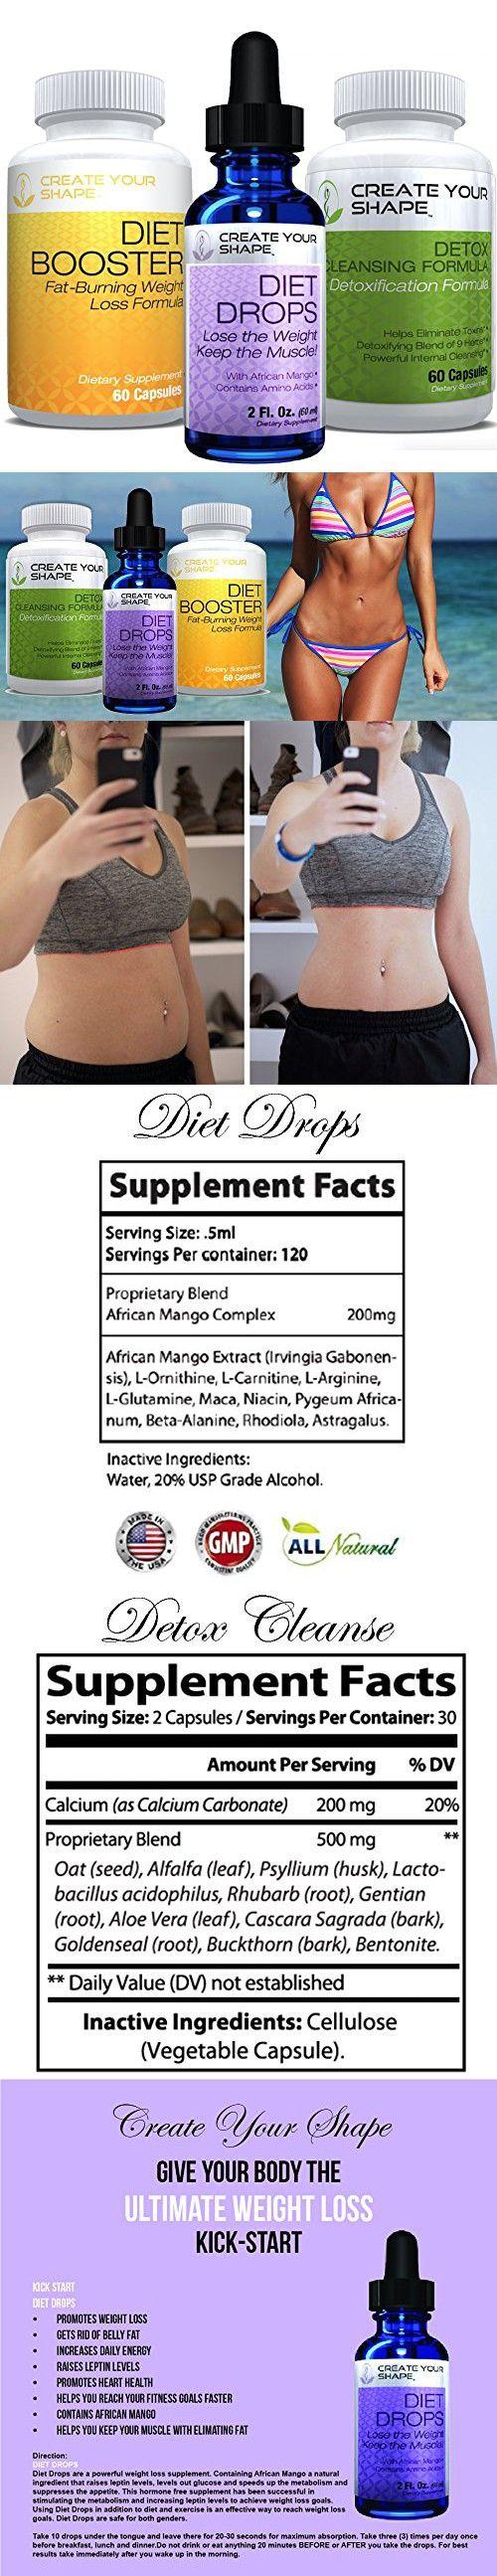 Best 25+ Amino acids ideas on Pinterest | Bodybuilding ...